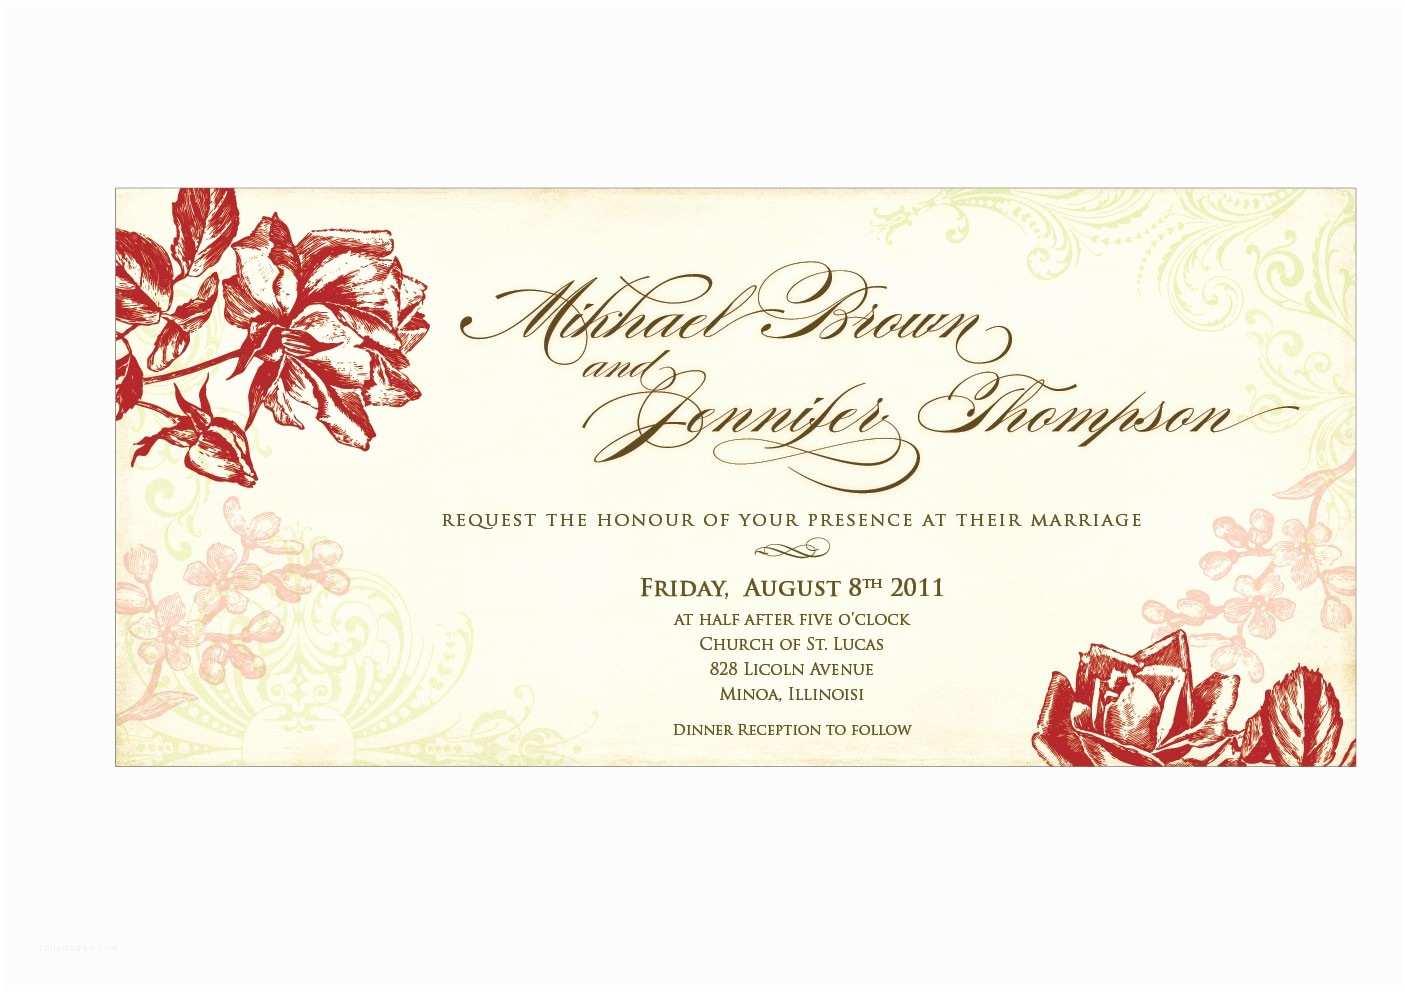 Online Editable Wedding Invitation Cards Free Download Free Wedding Invitation Card Template Best Sample